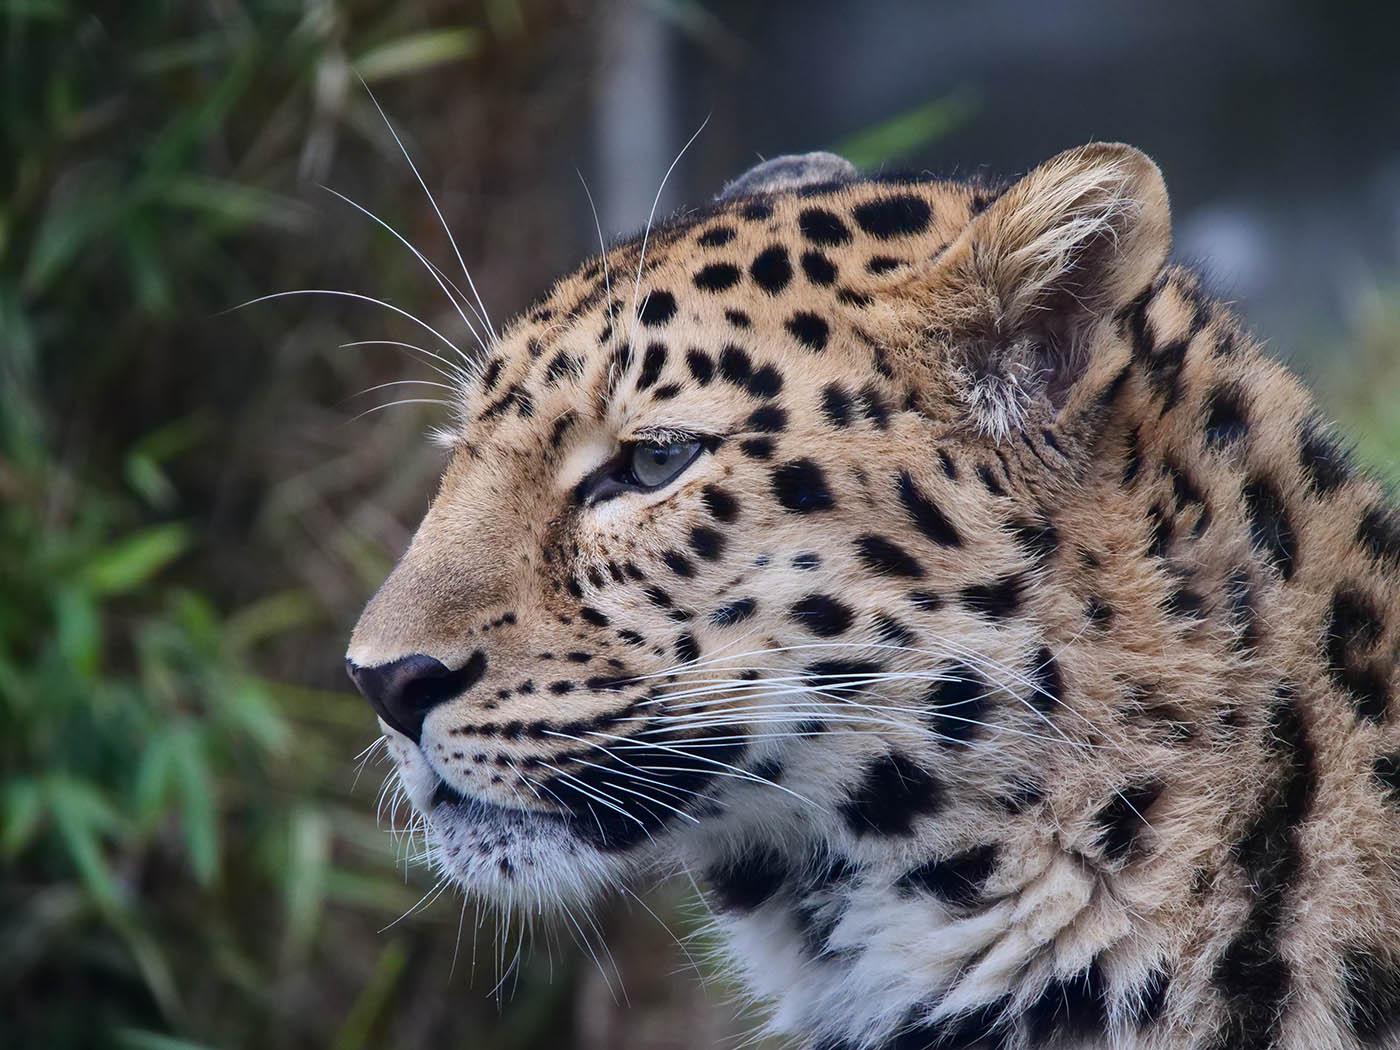 photo animalière prise avec objectif Olympus 12-200 mm